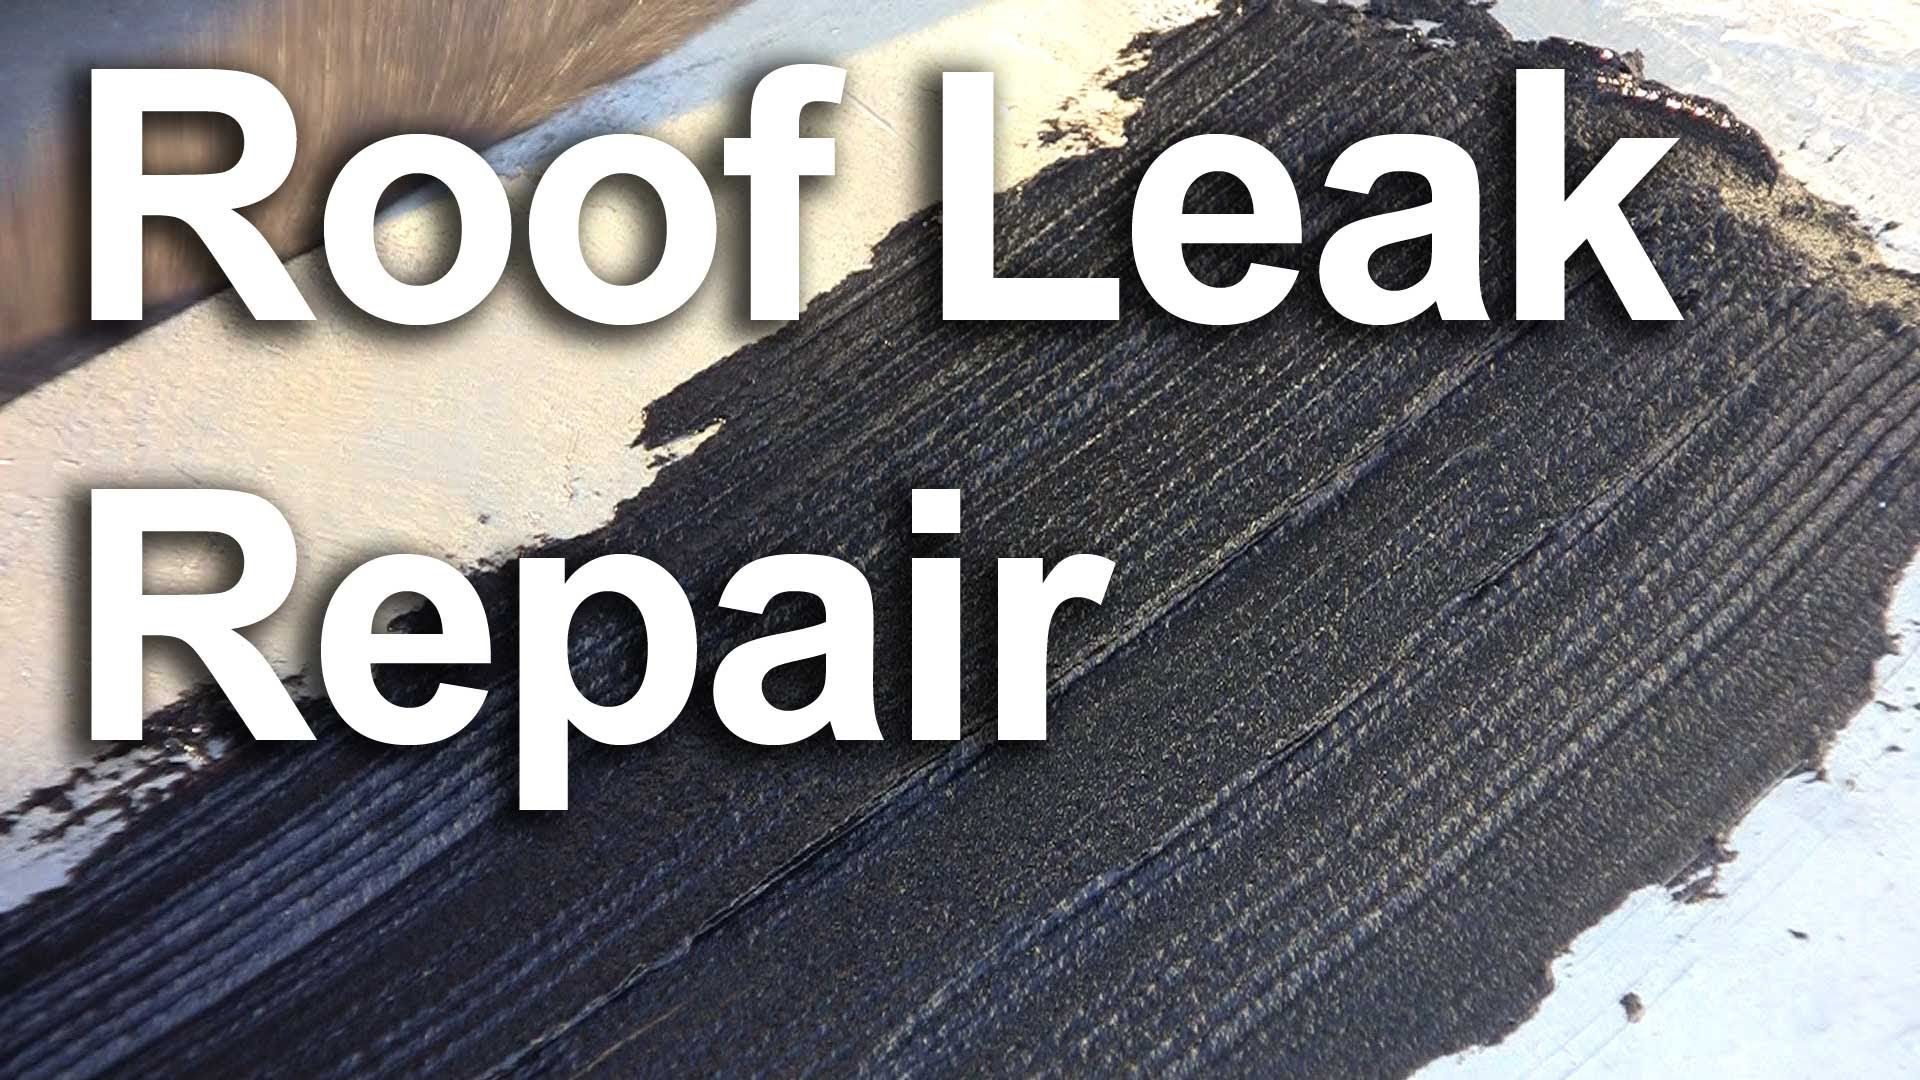 House Roof Leaking http://www.mobilehomerepairtips